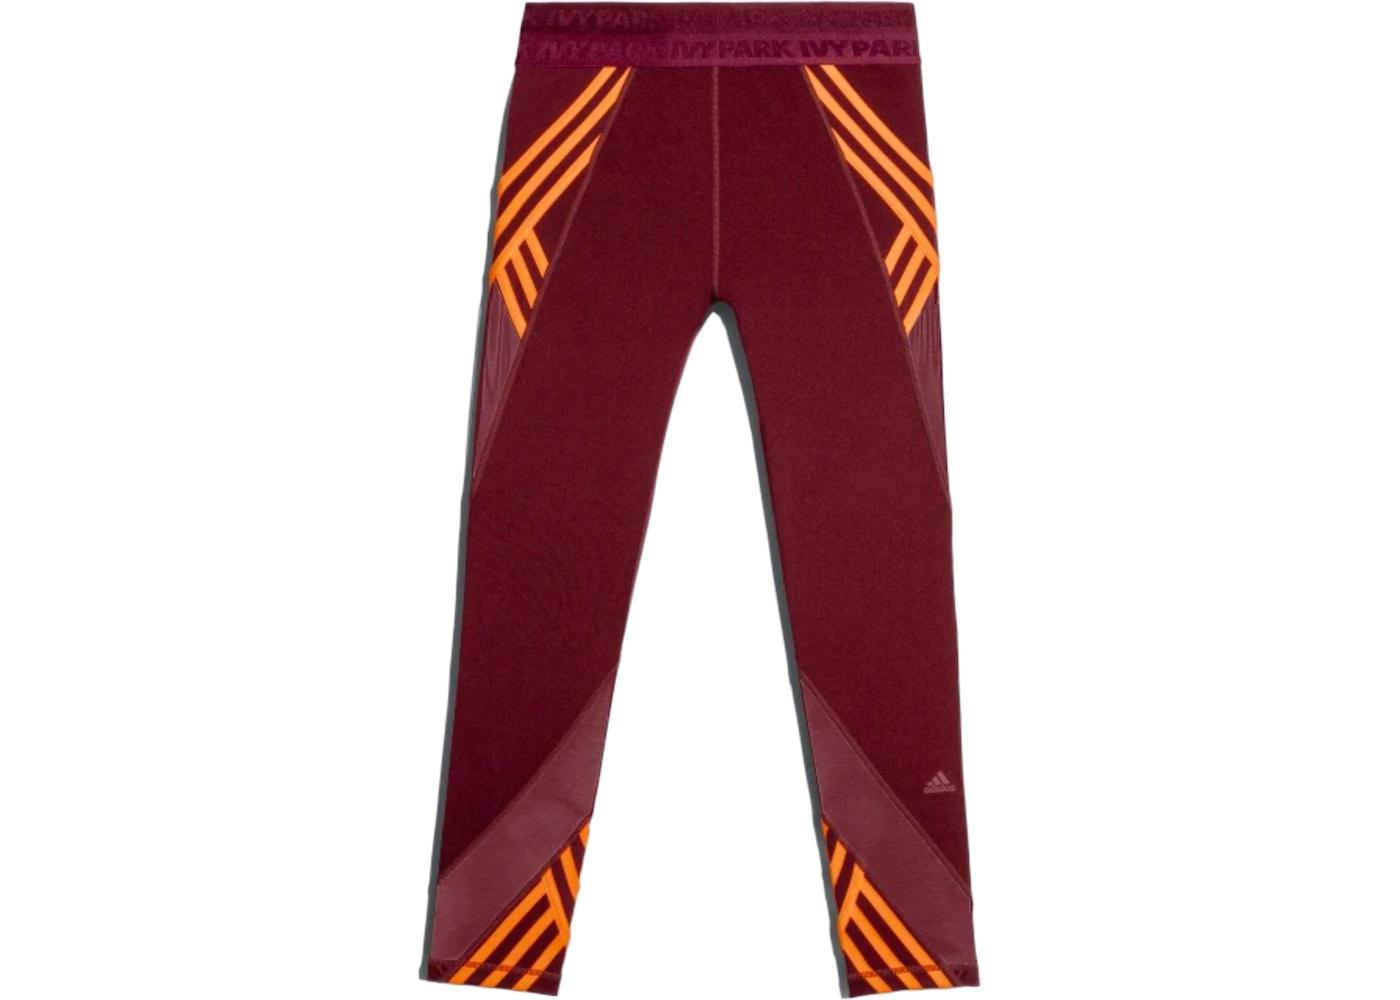 7/8 adidas leggings